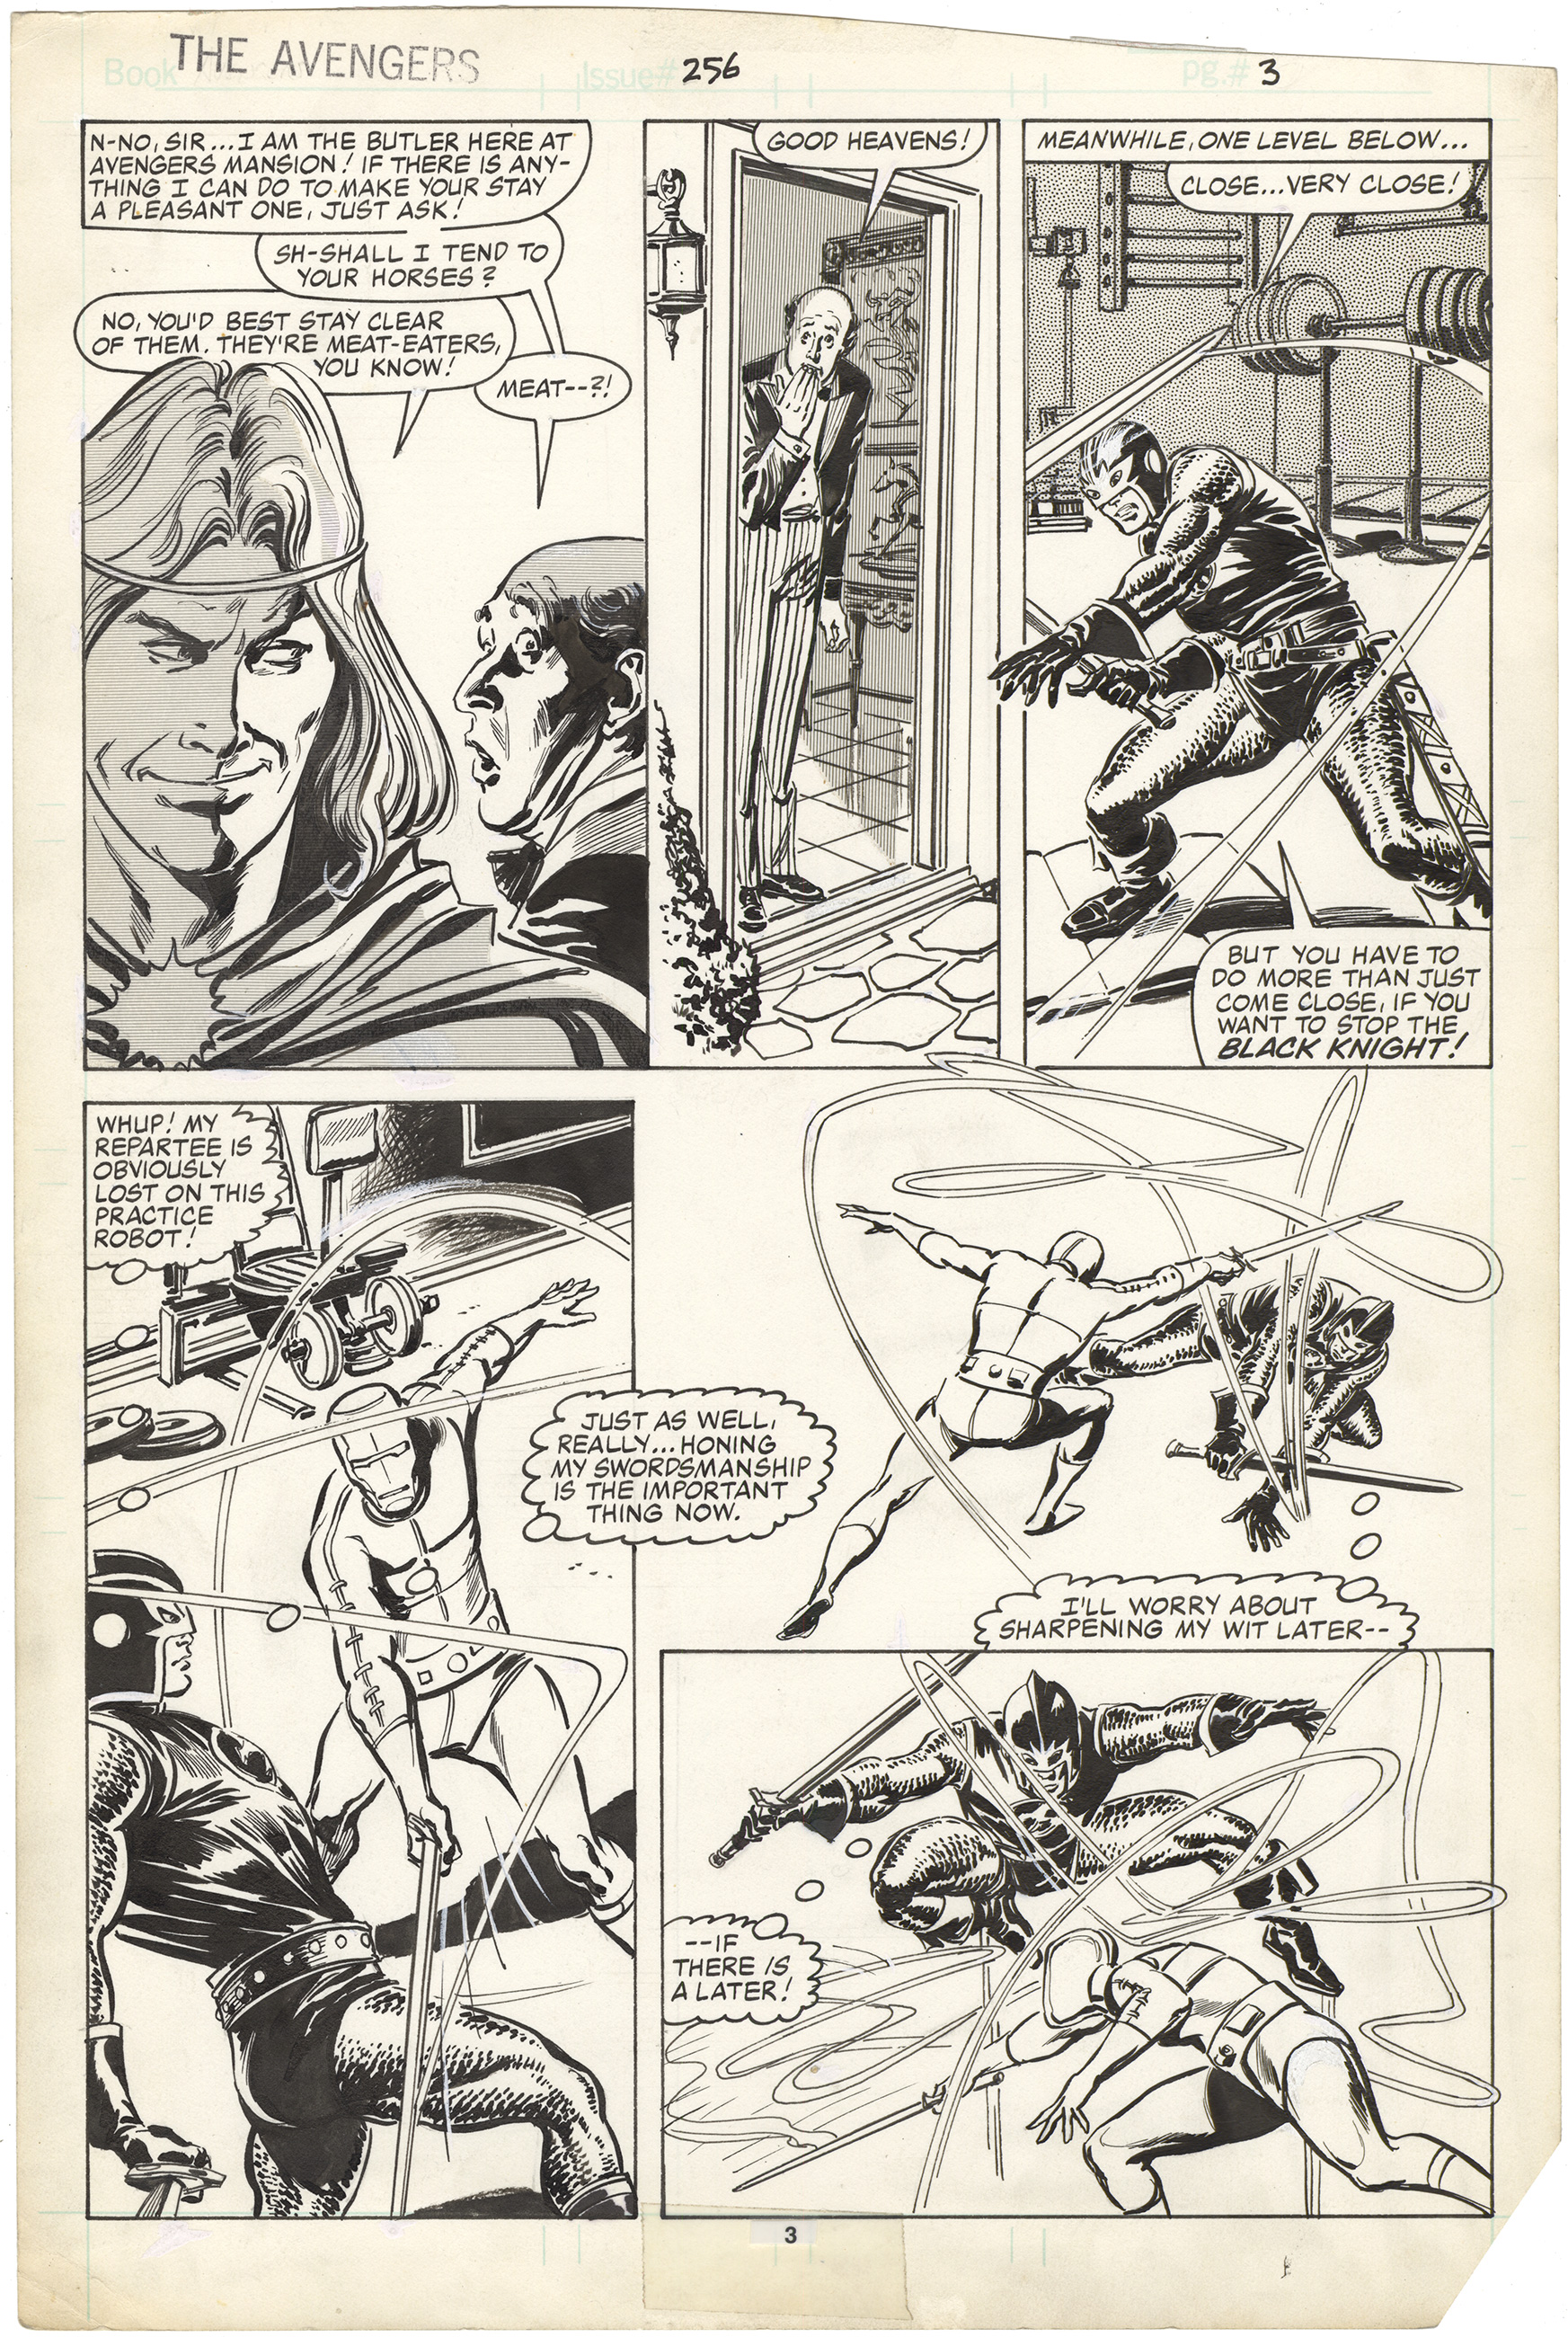 Avengers #256 p3